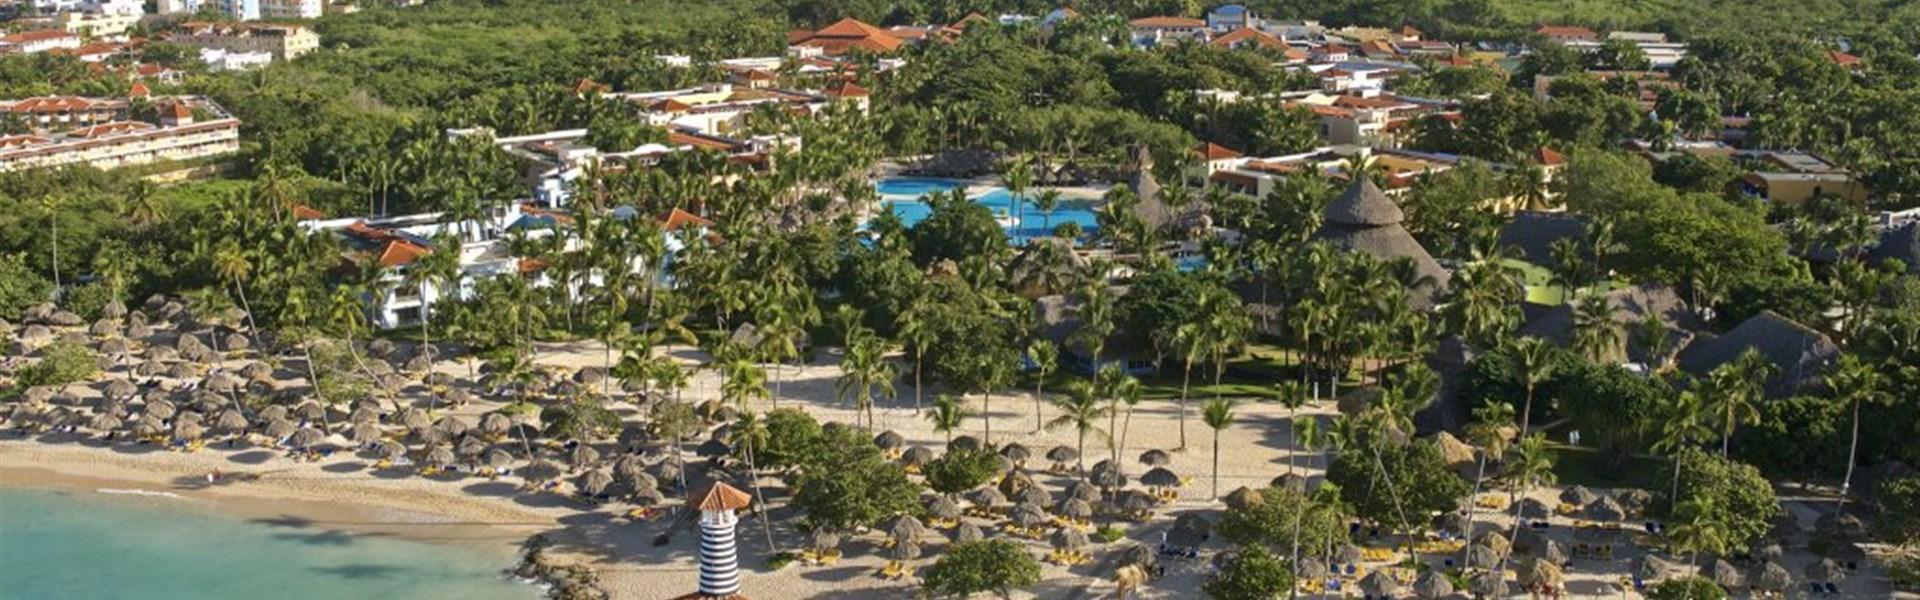 Marco Polo - Iberostar Hacienda Dominicus Bayahibe -